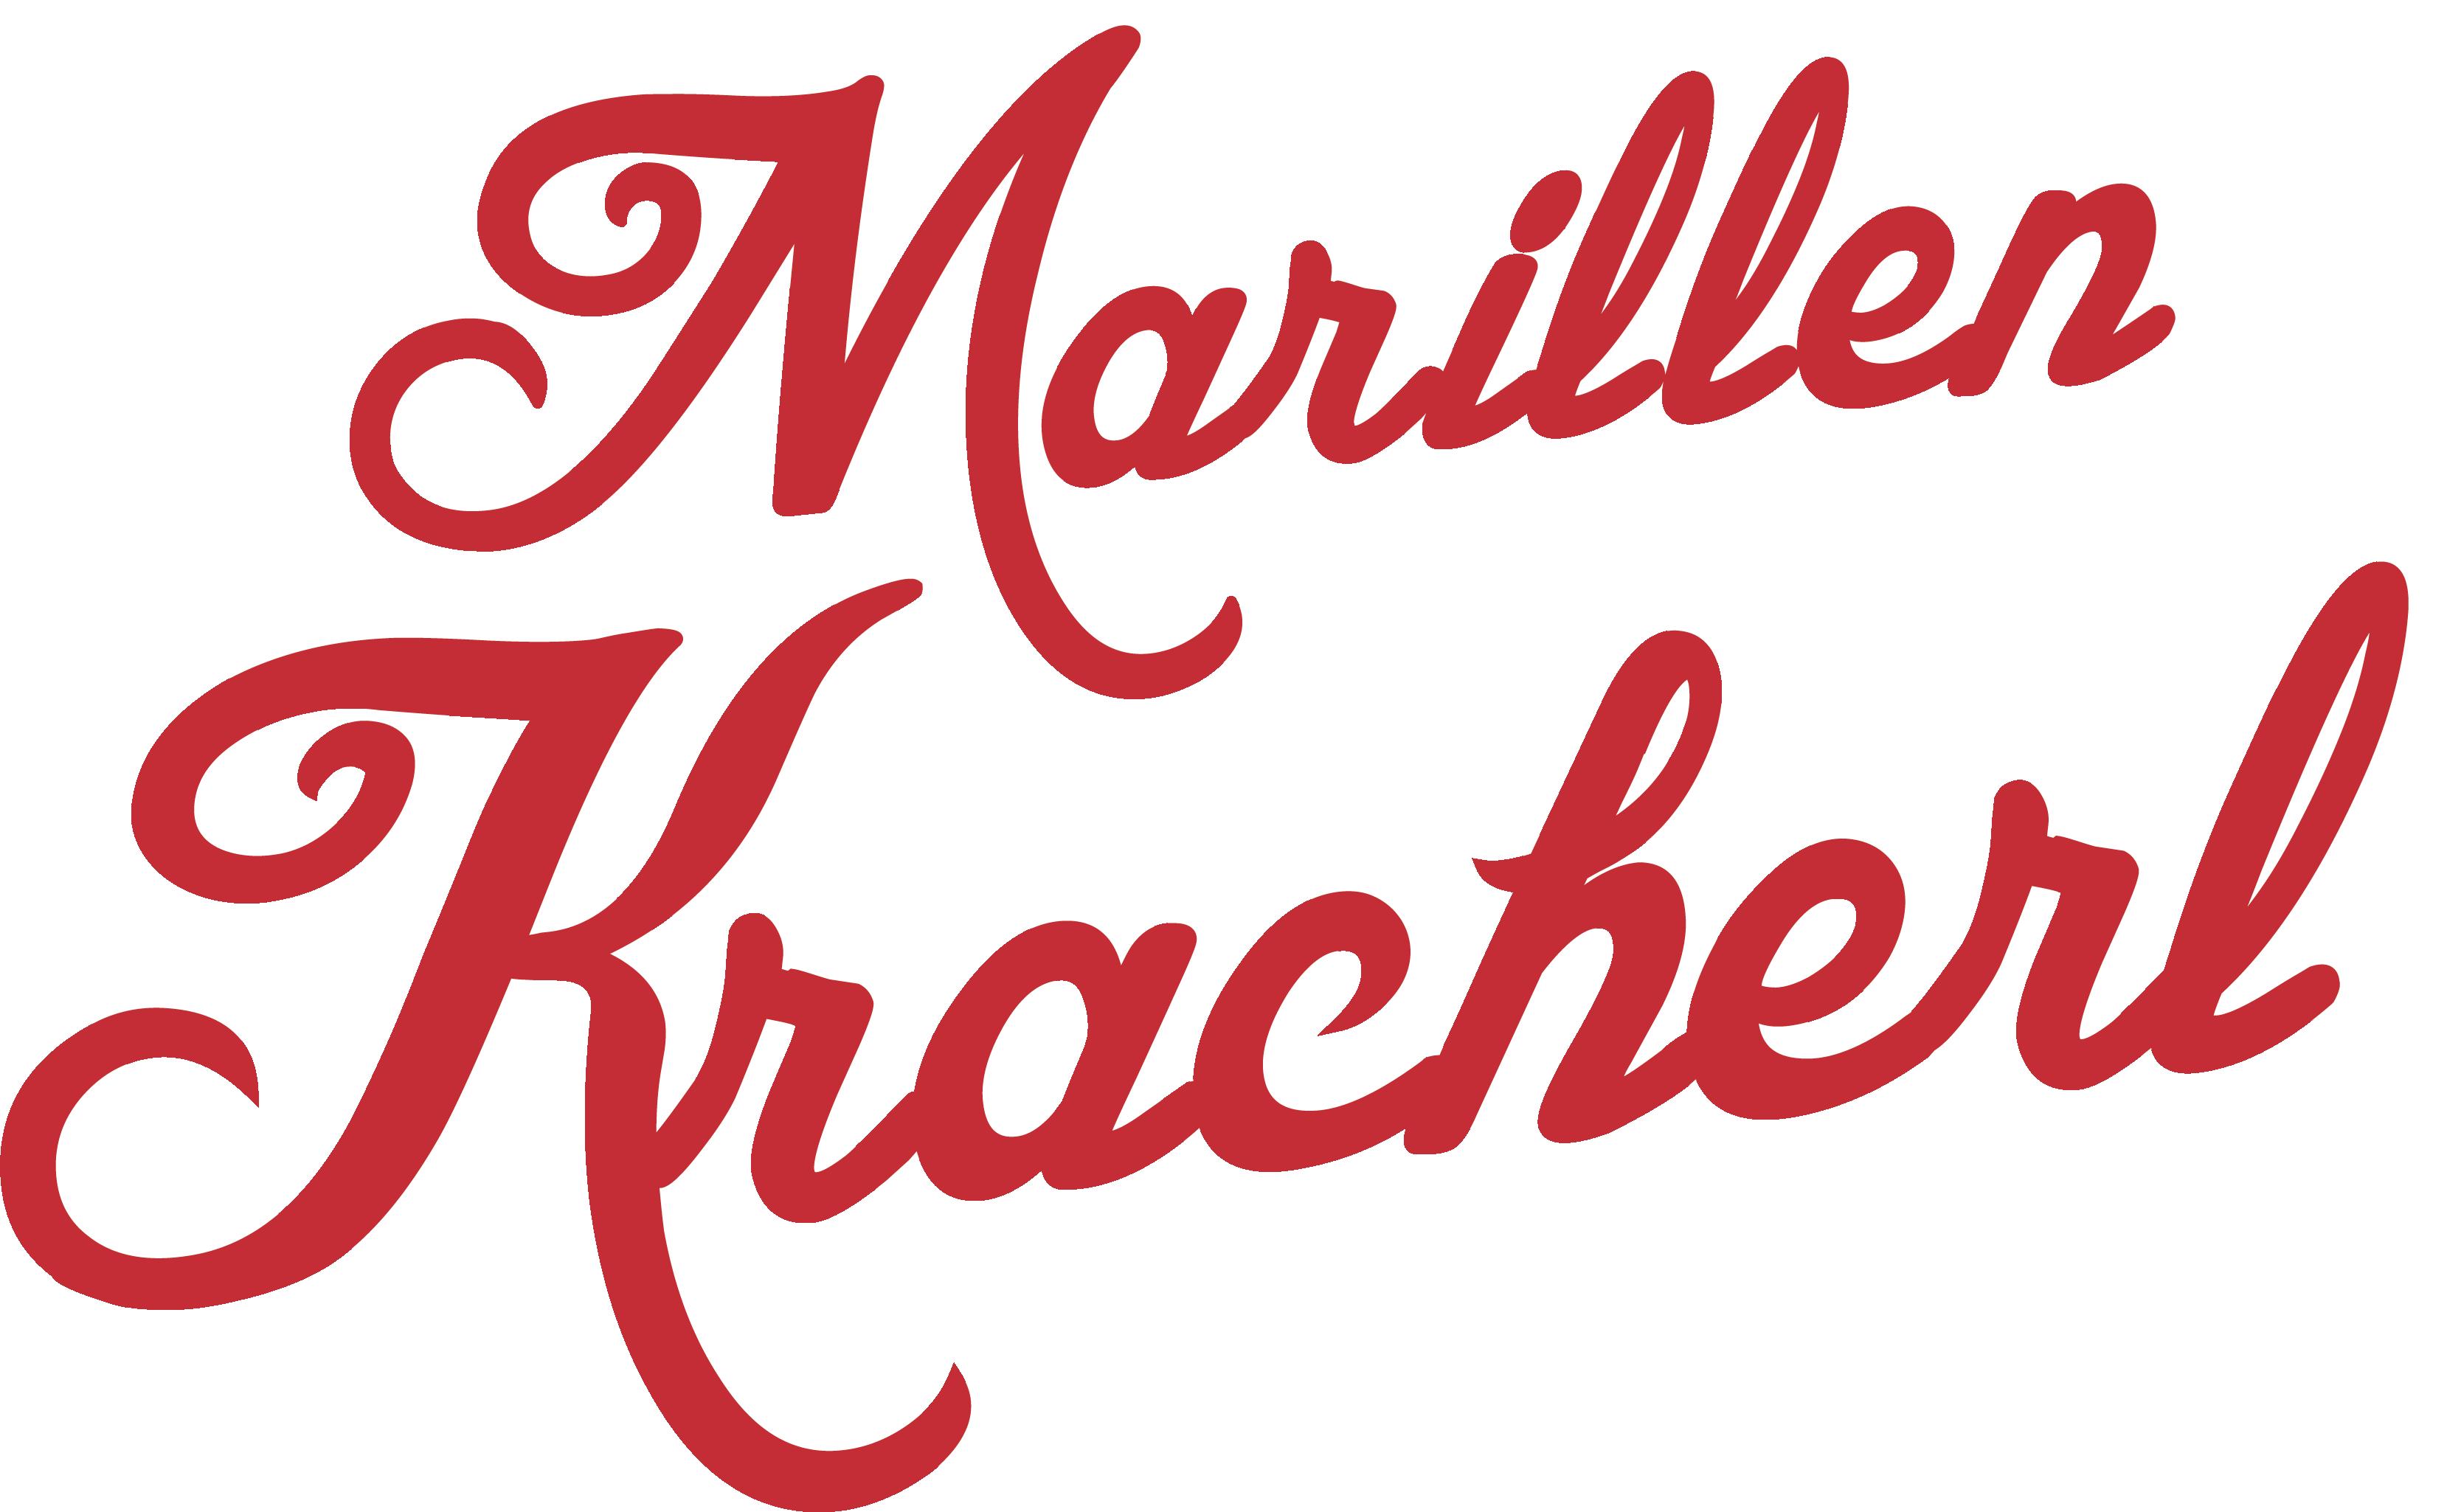 Marillen Kracherl